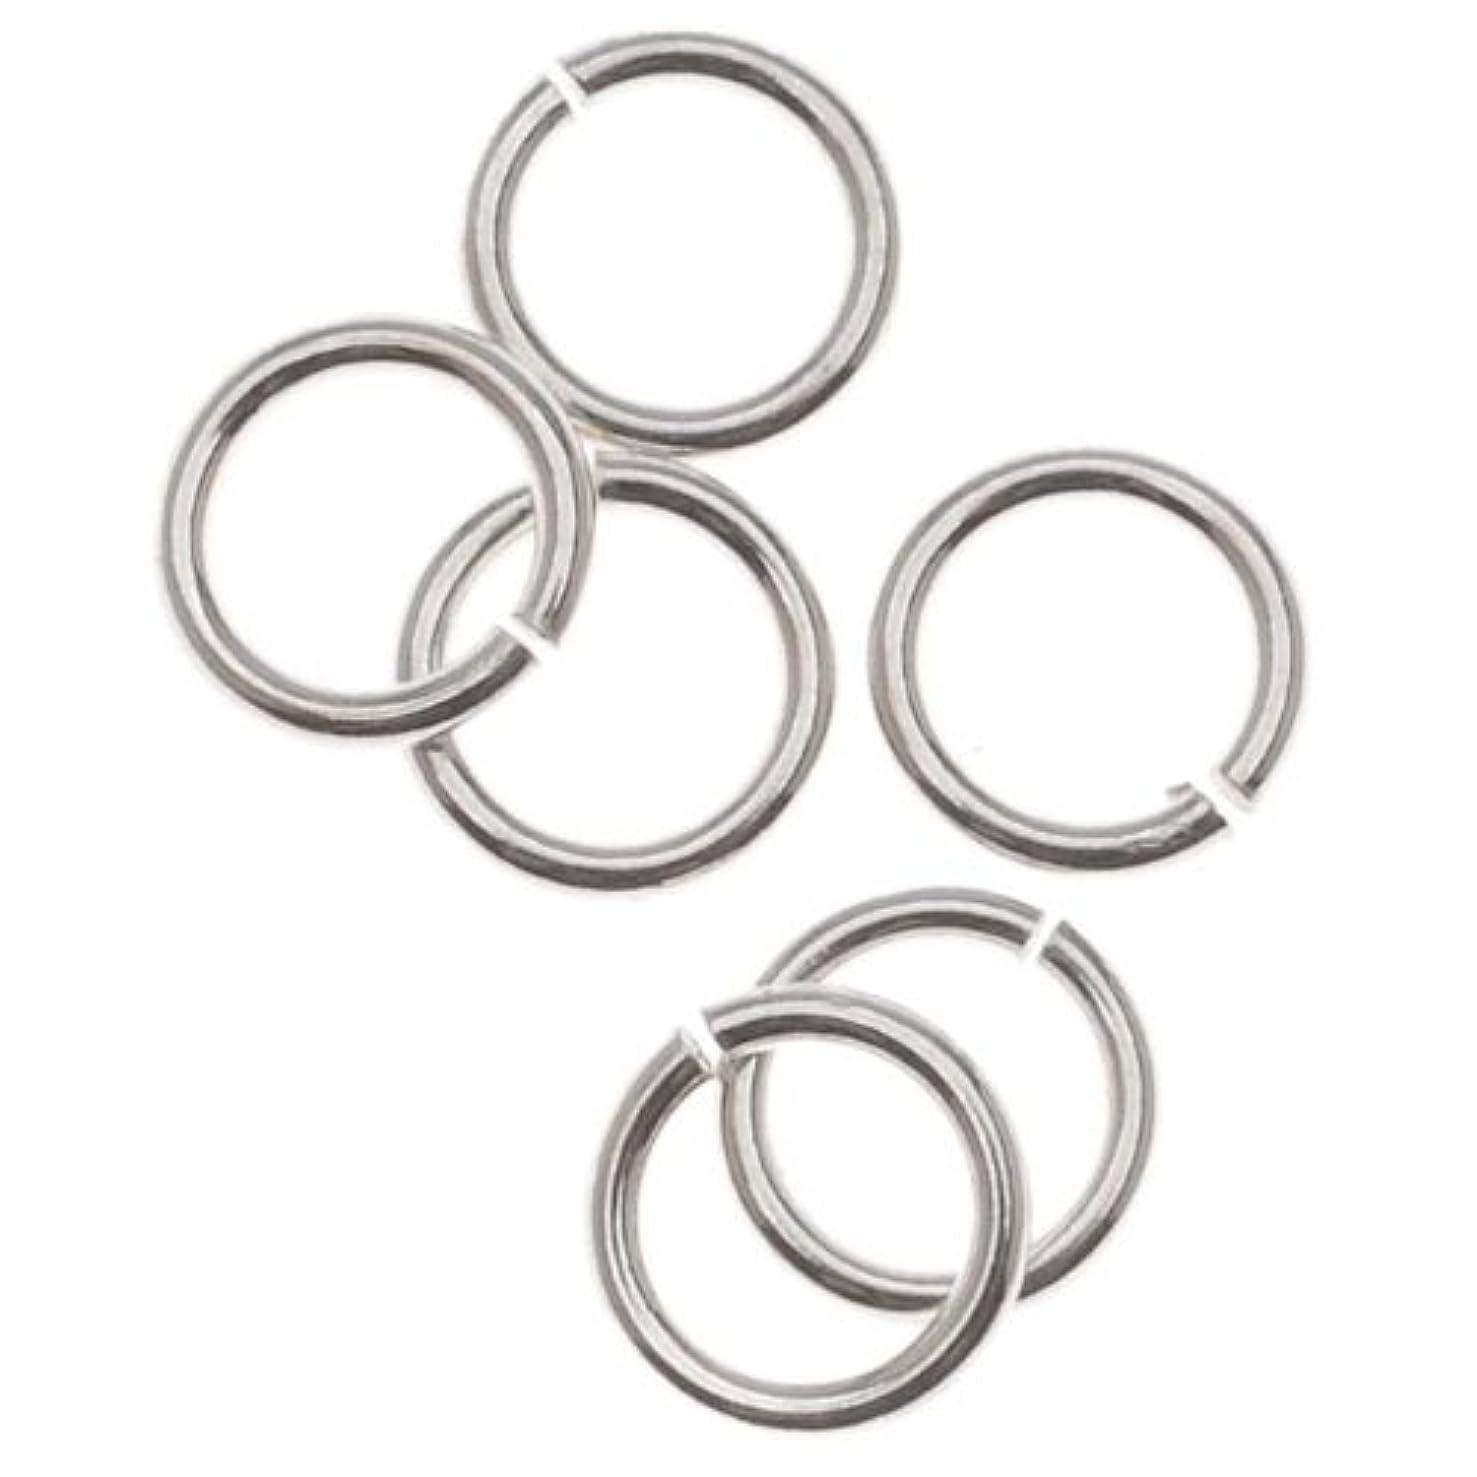 Beadaholique SS/JR28/5 10-Piece Sterling Open Jump Rings, 5mm, 21-Gauge, Silver